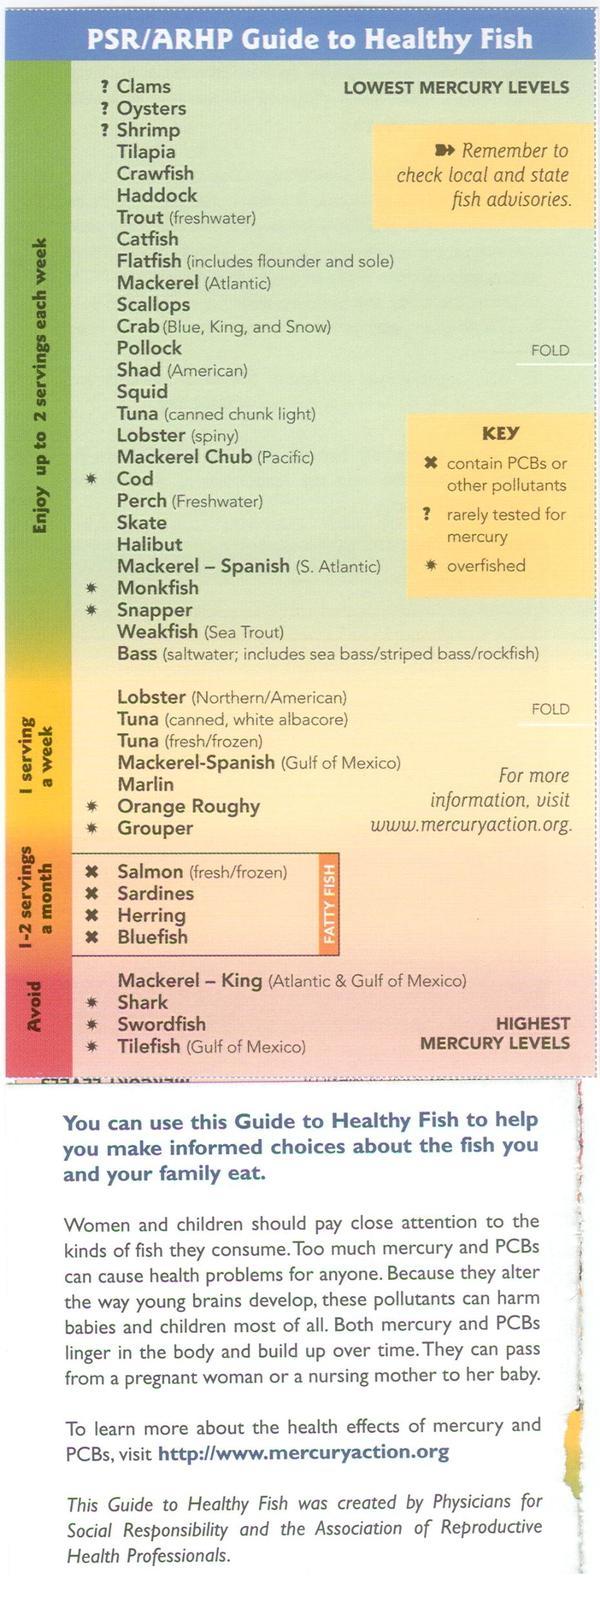 Rohu mercury content answers on healthtap for Branzino fish mercury level